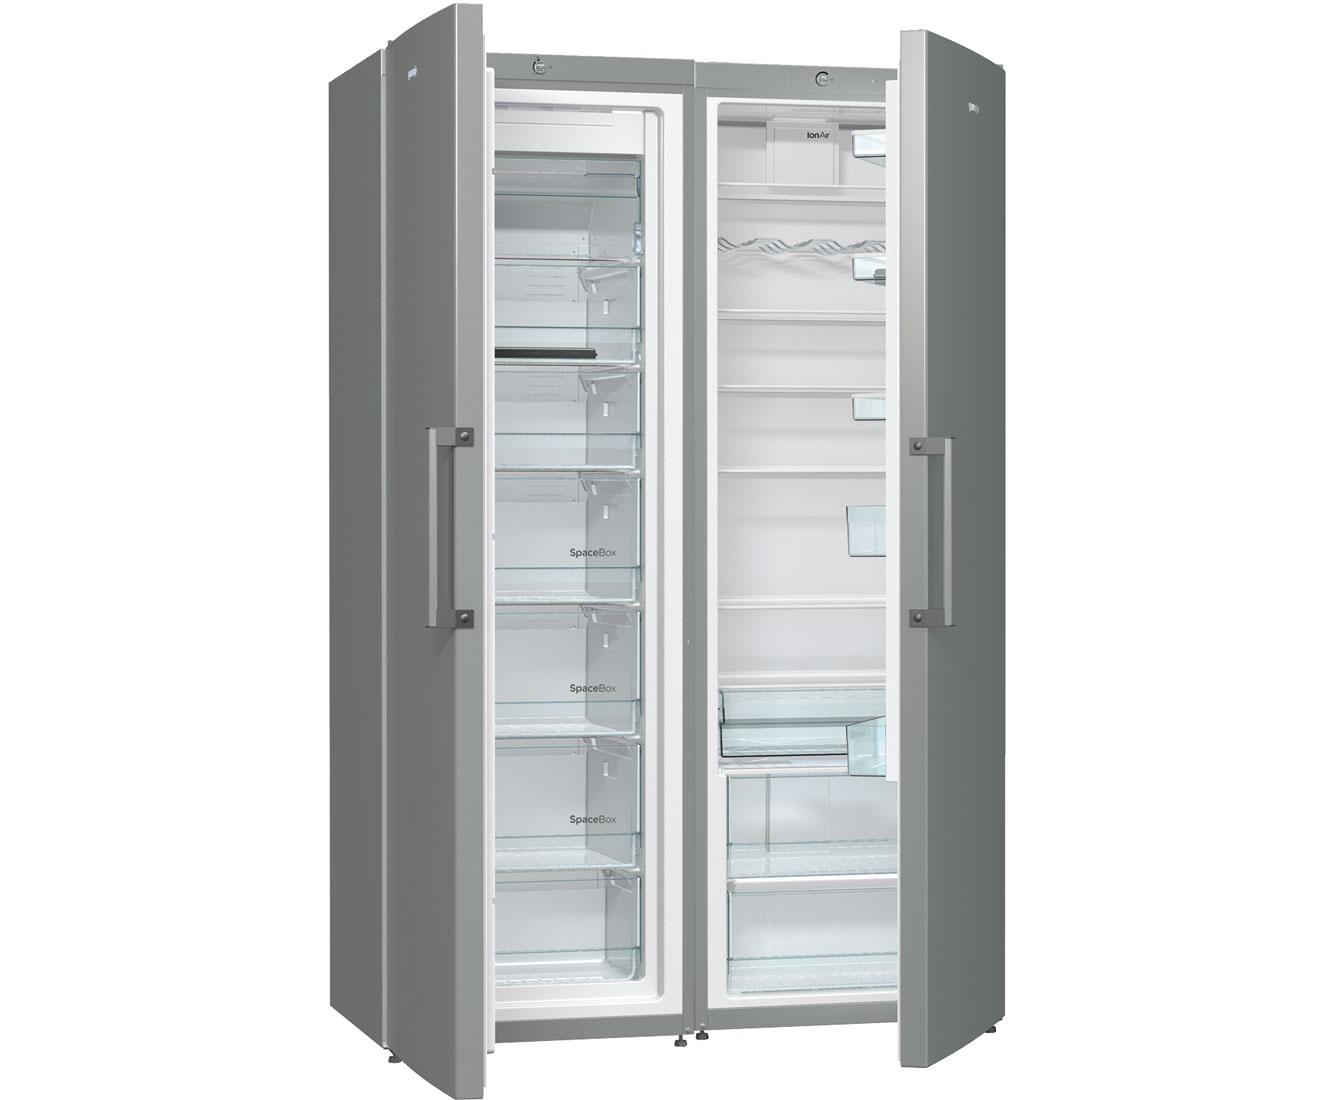 Gorenje Kühlschrank Zweitürig : Gorenje kühlschrank side by side kühlschrank gefrierschrank